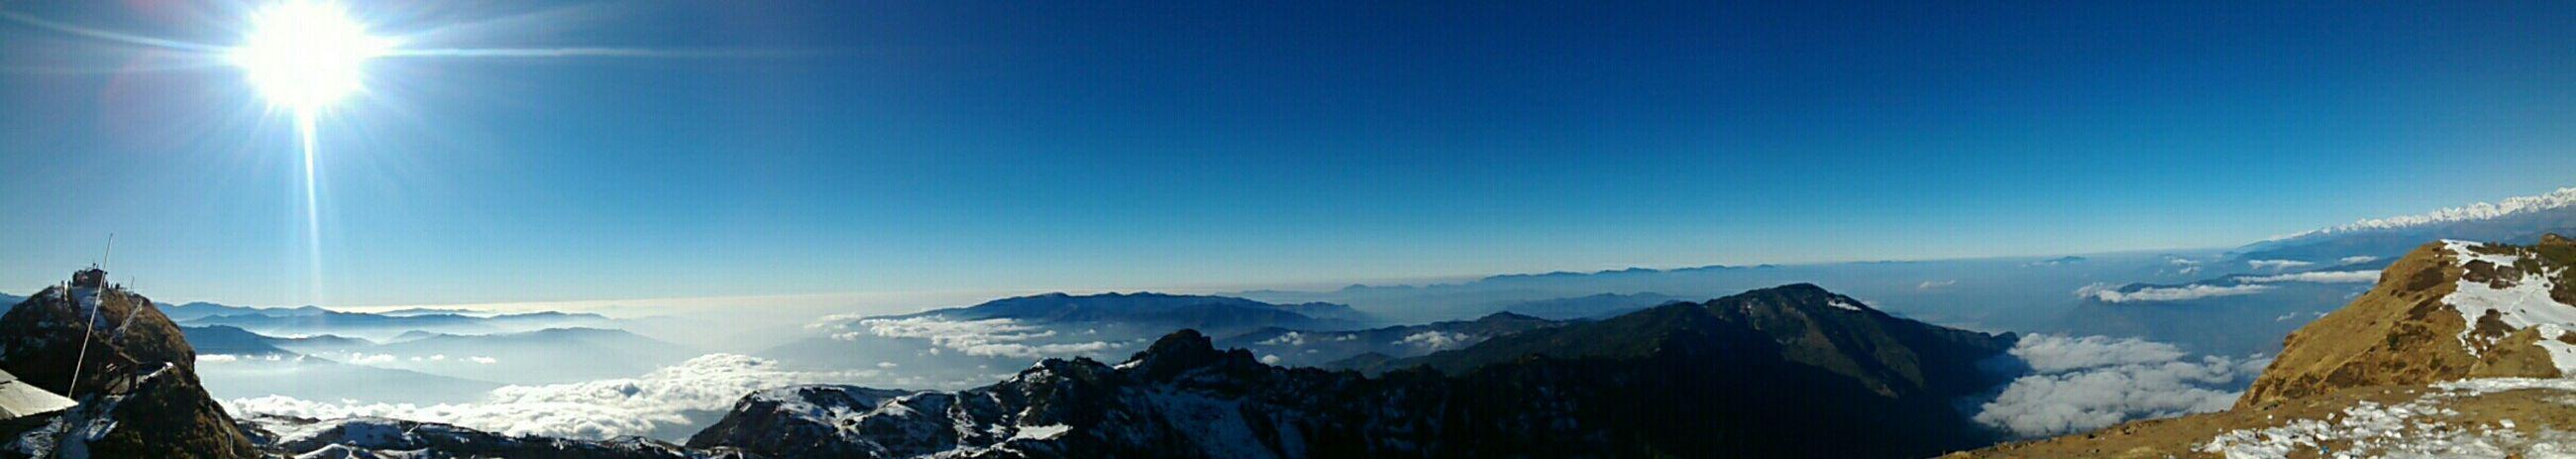 3700m Kalinchok Trek Horizon